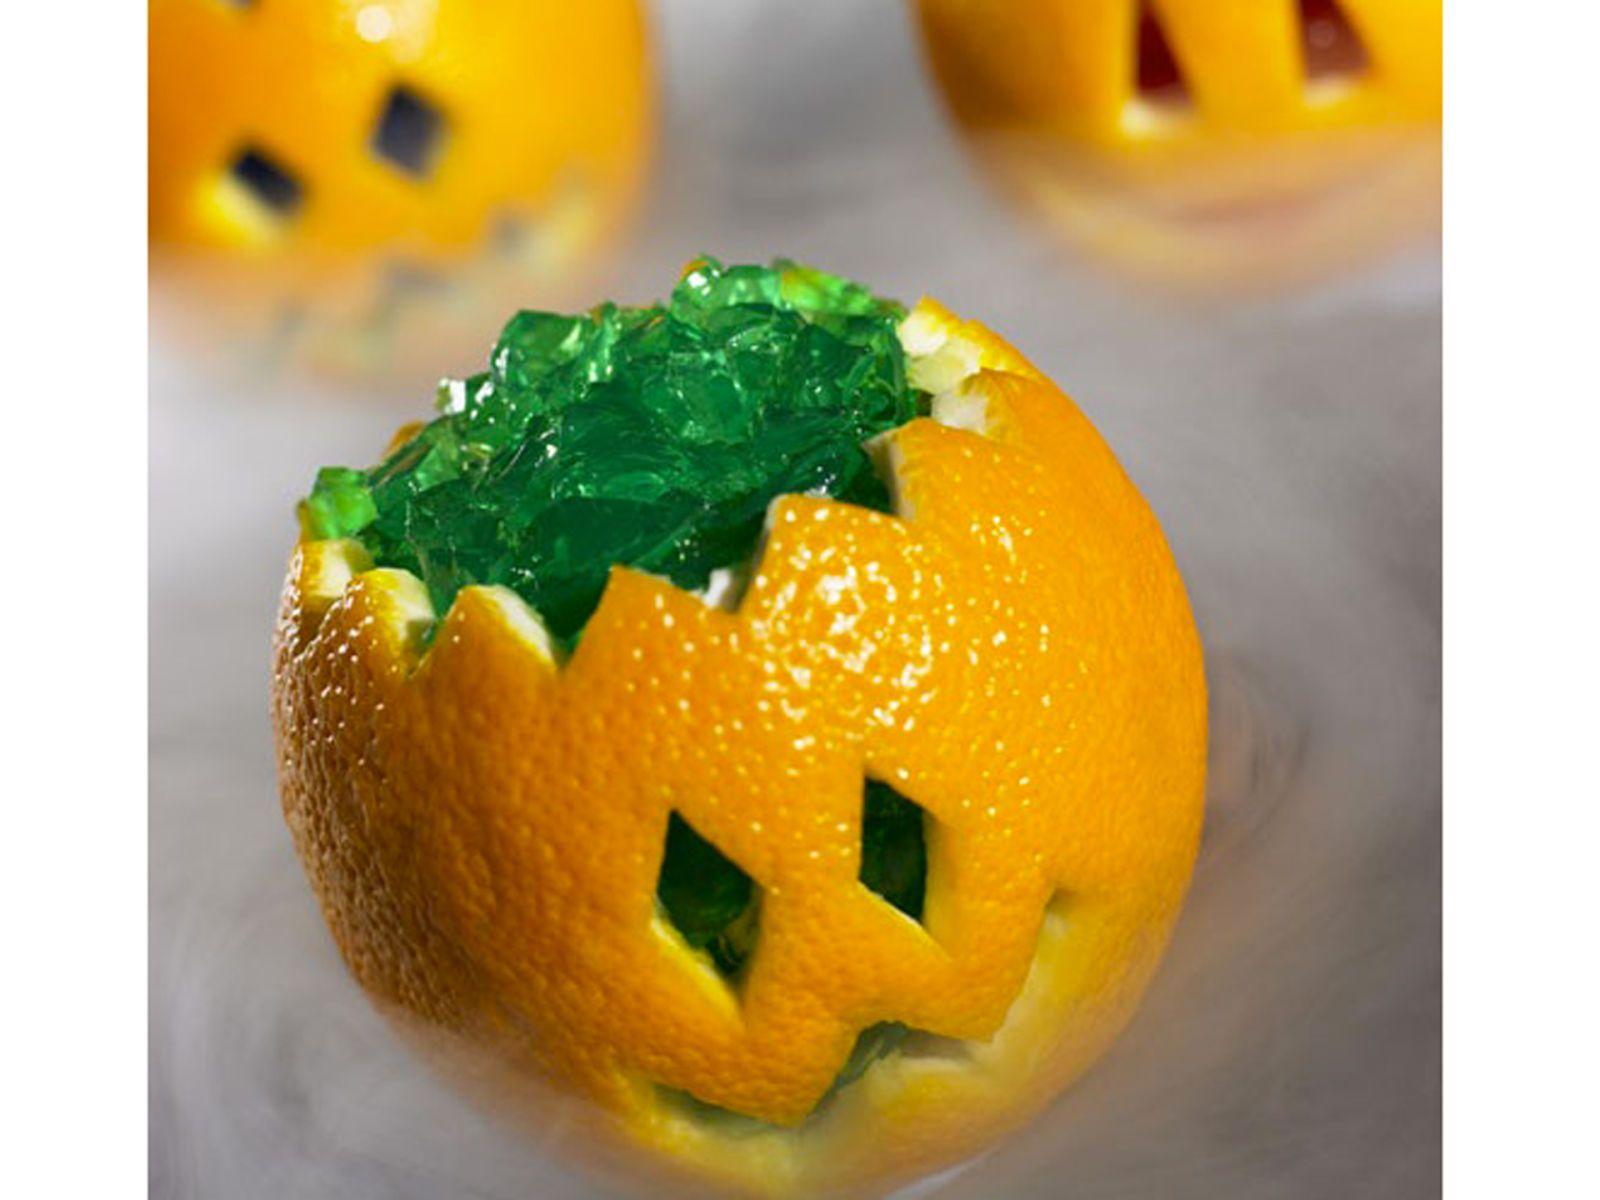 jello pumpkins for halloween